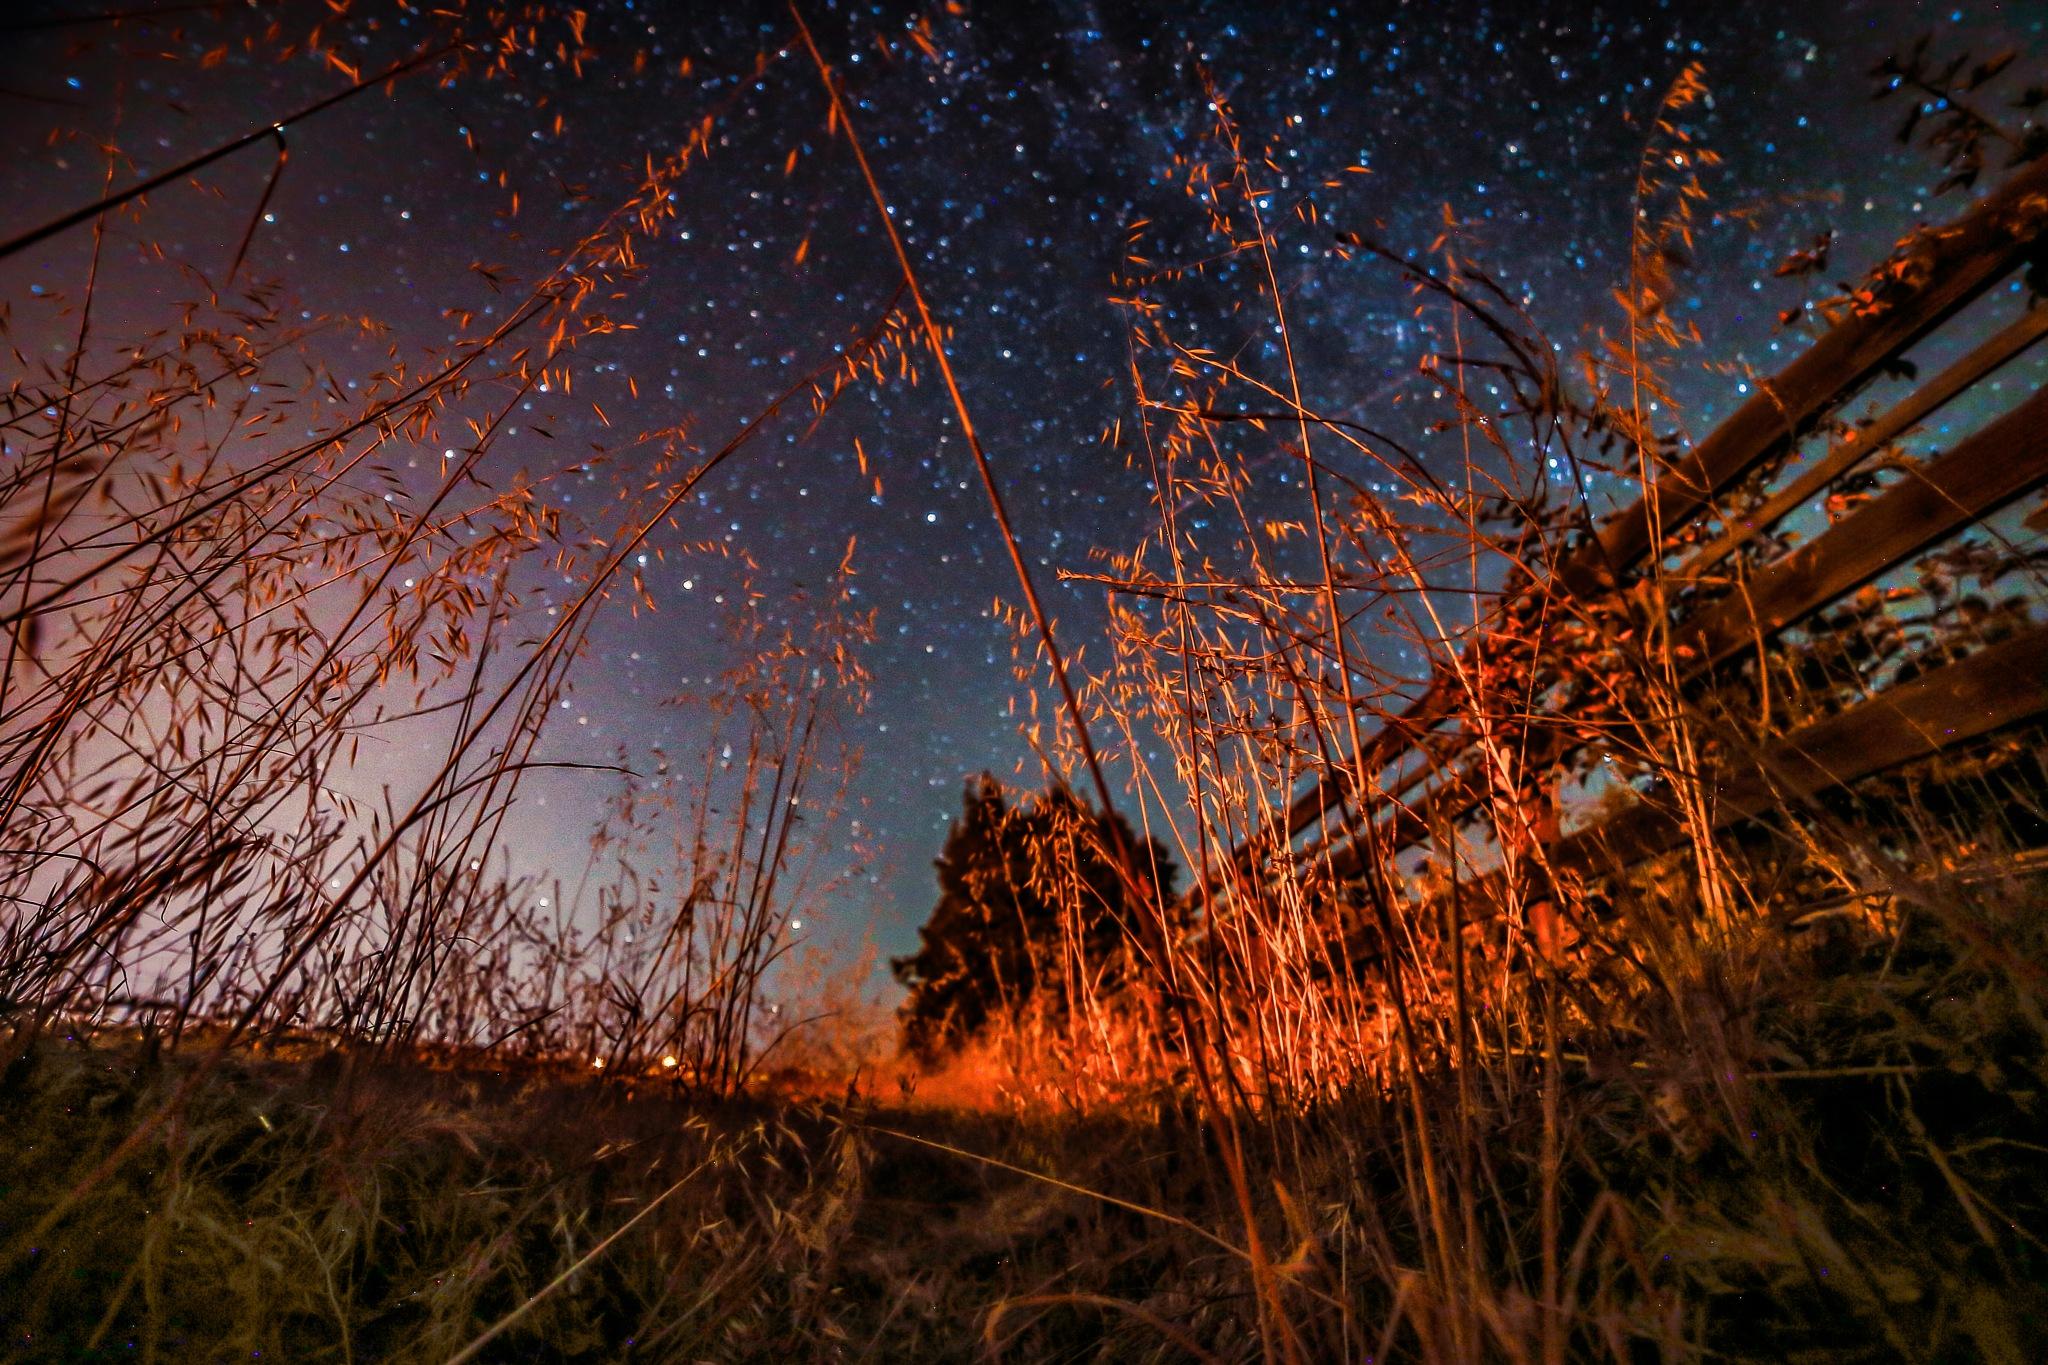 starry night by volkhard sturzbecher